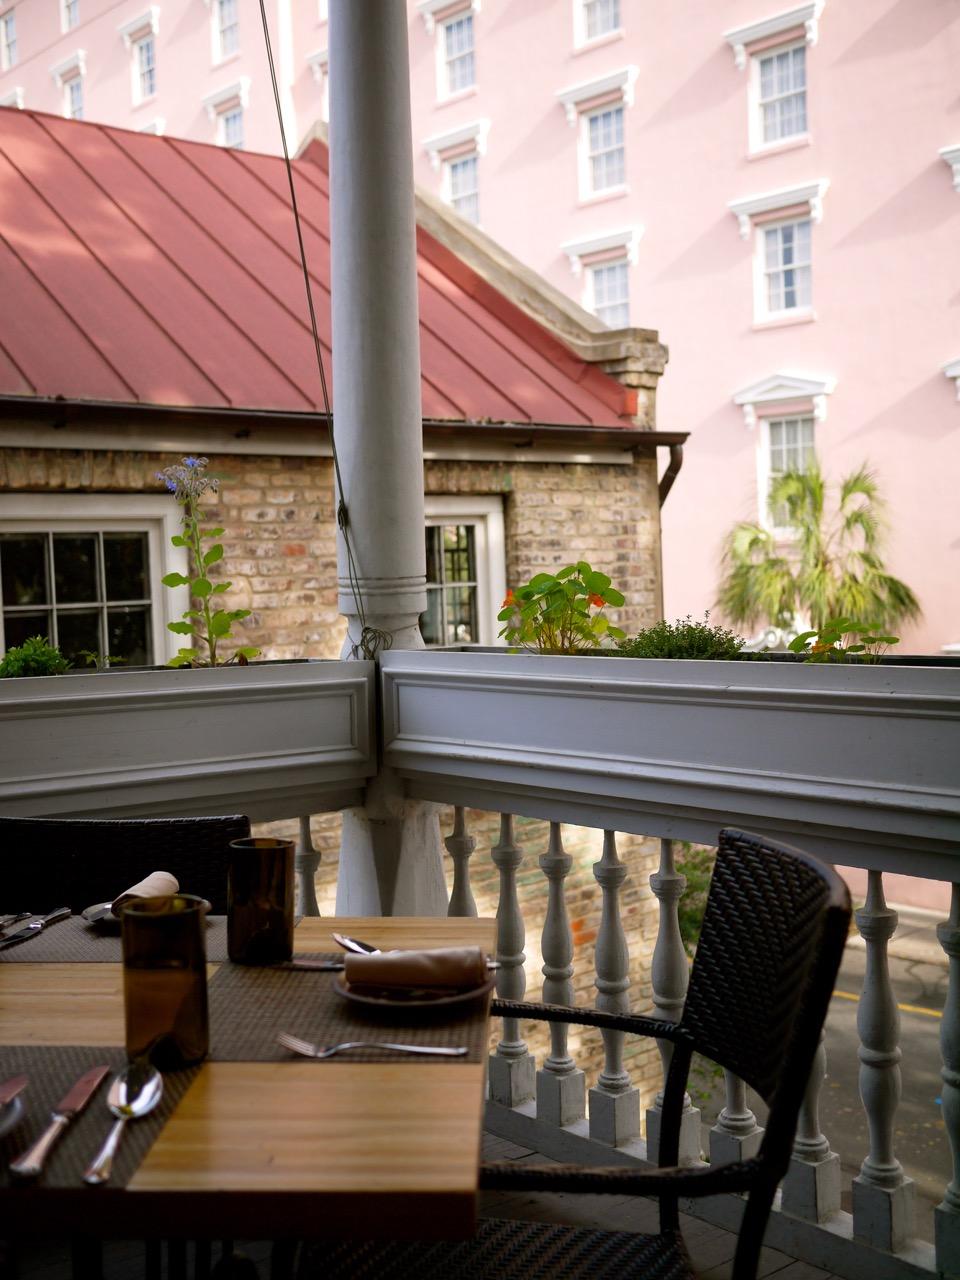 Husk charleston godsavethescene for Balcony upstairs